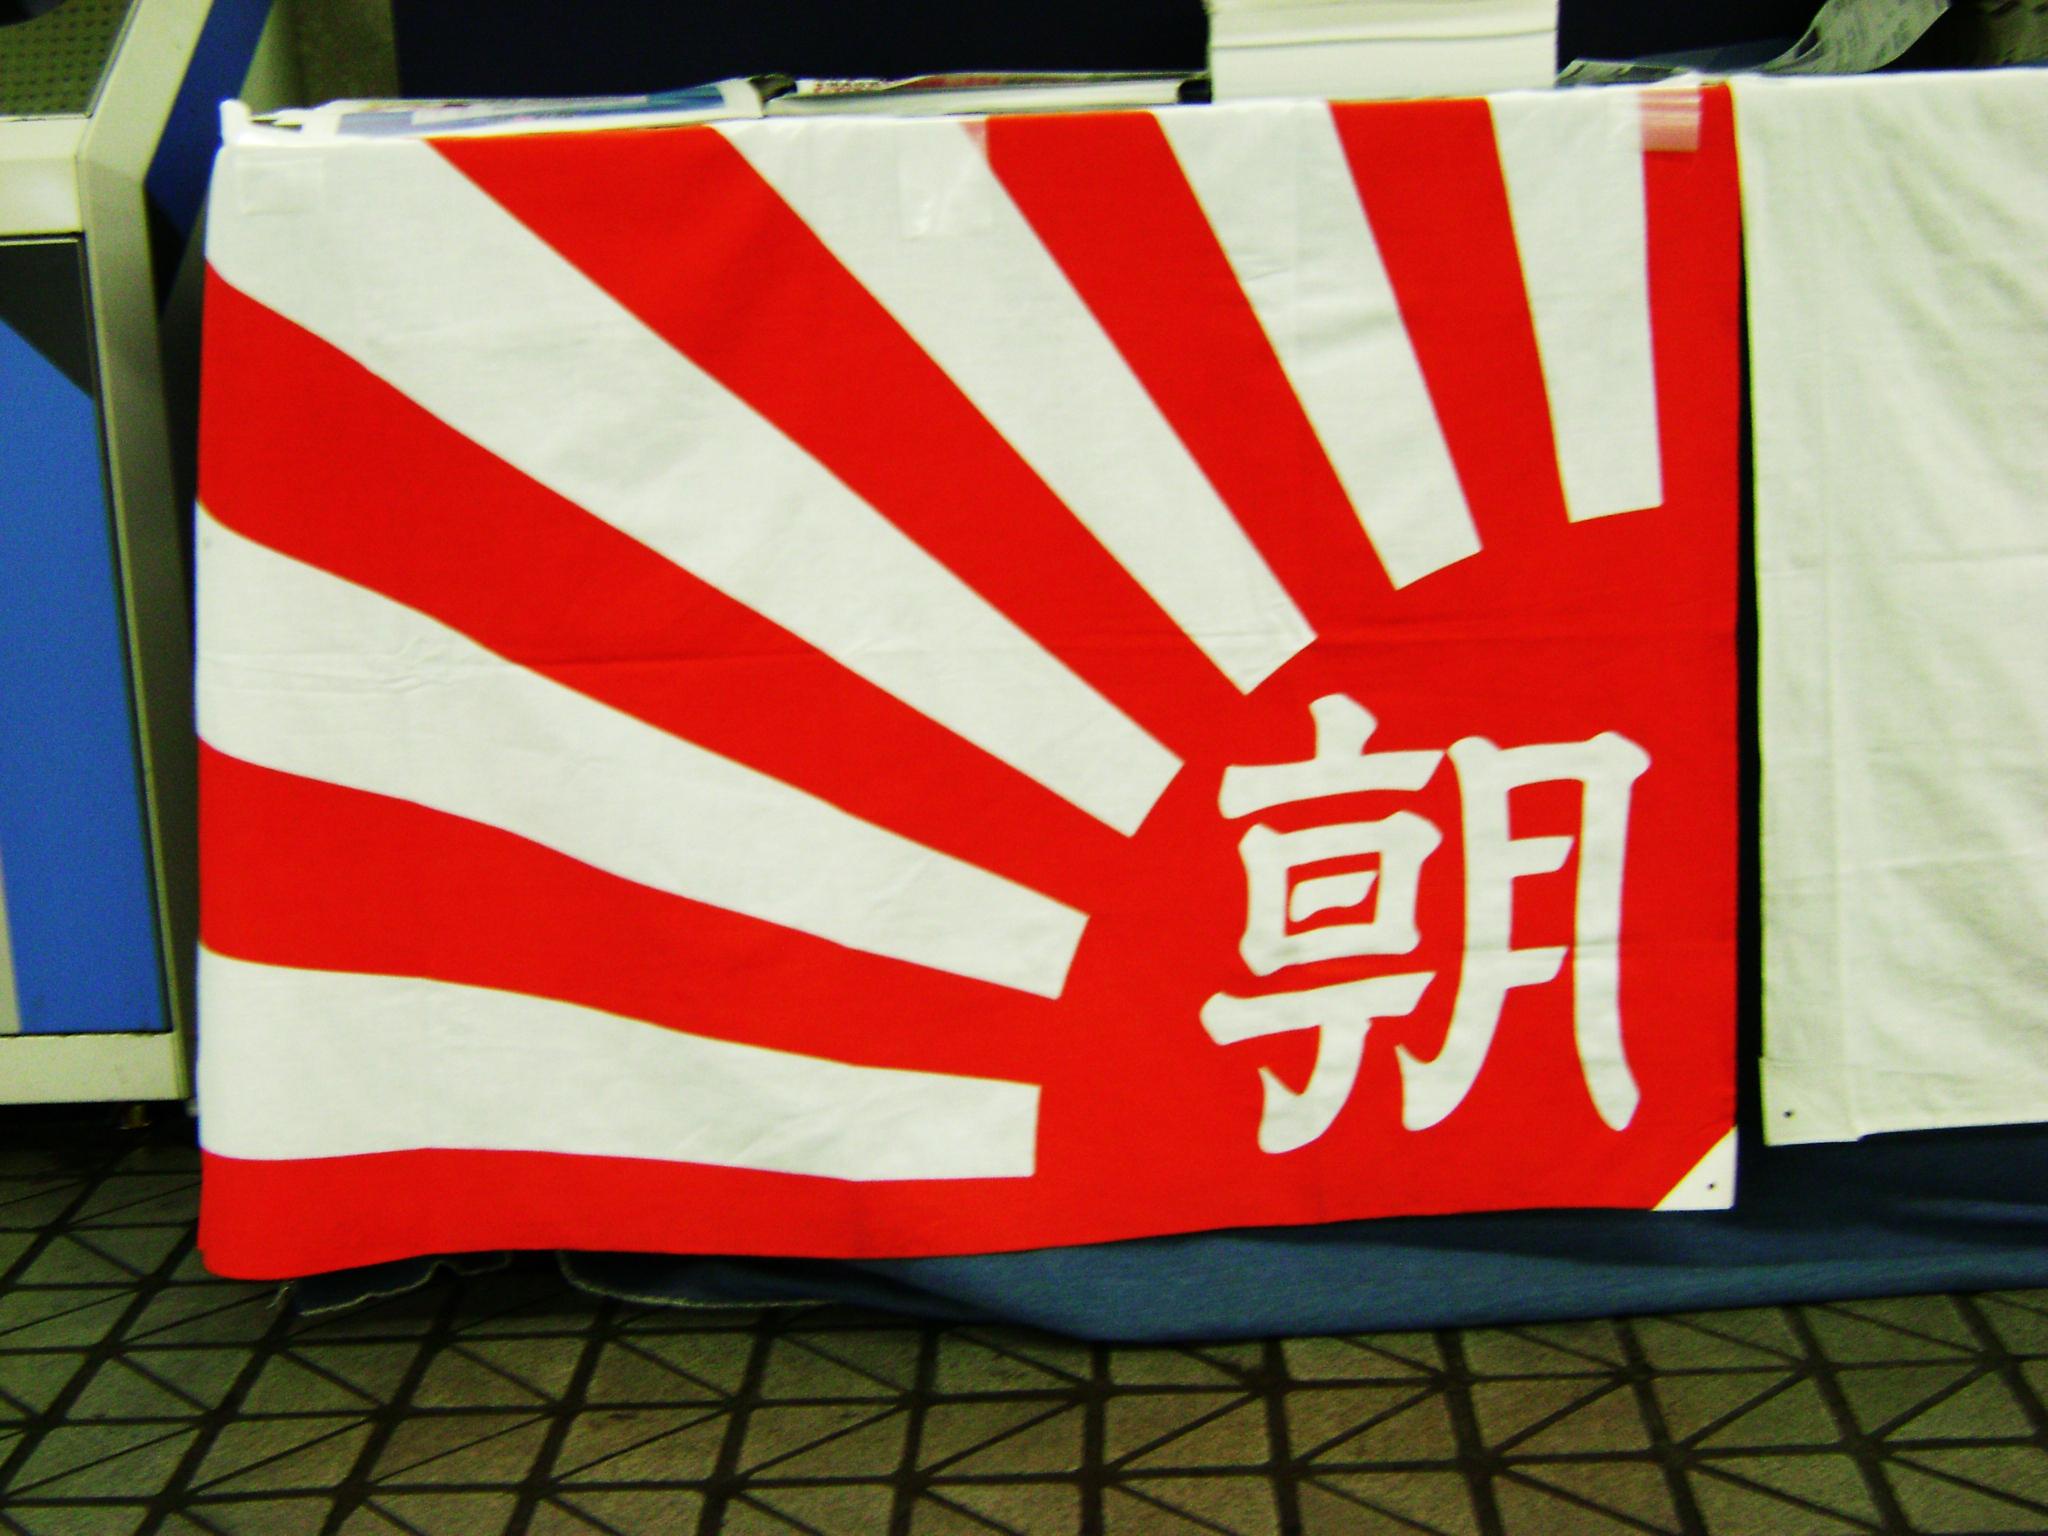 http://upload.wikimedia.org/wikipedia/commons/c/c4/Flag_of_the_Asahi_Shinbun_Company.jpg